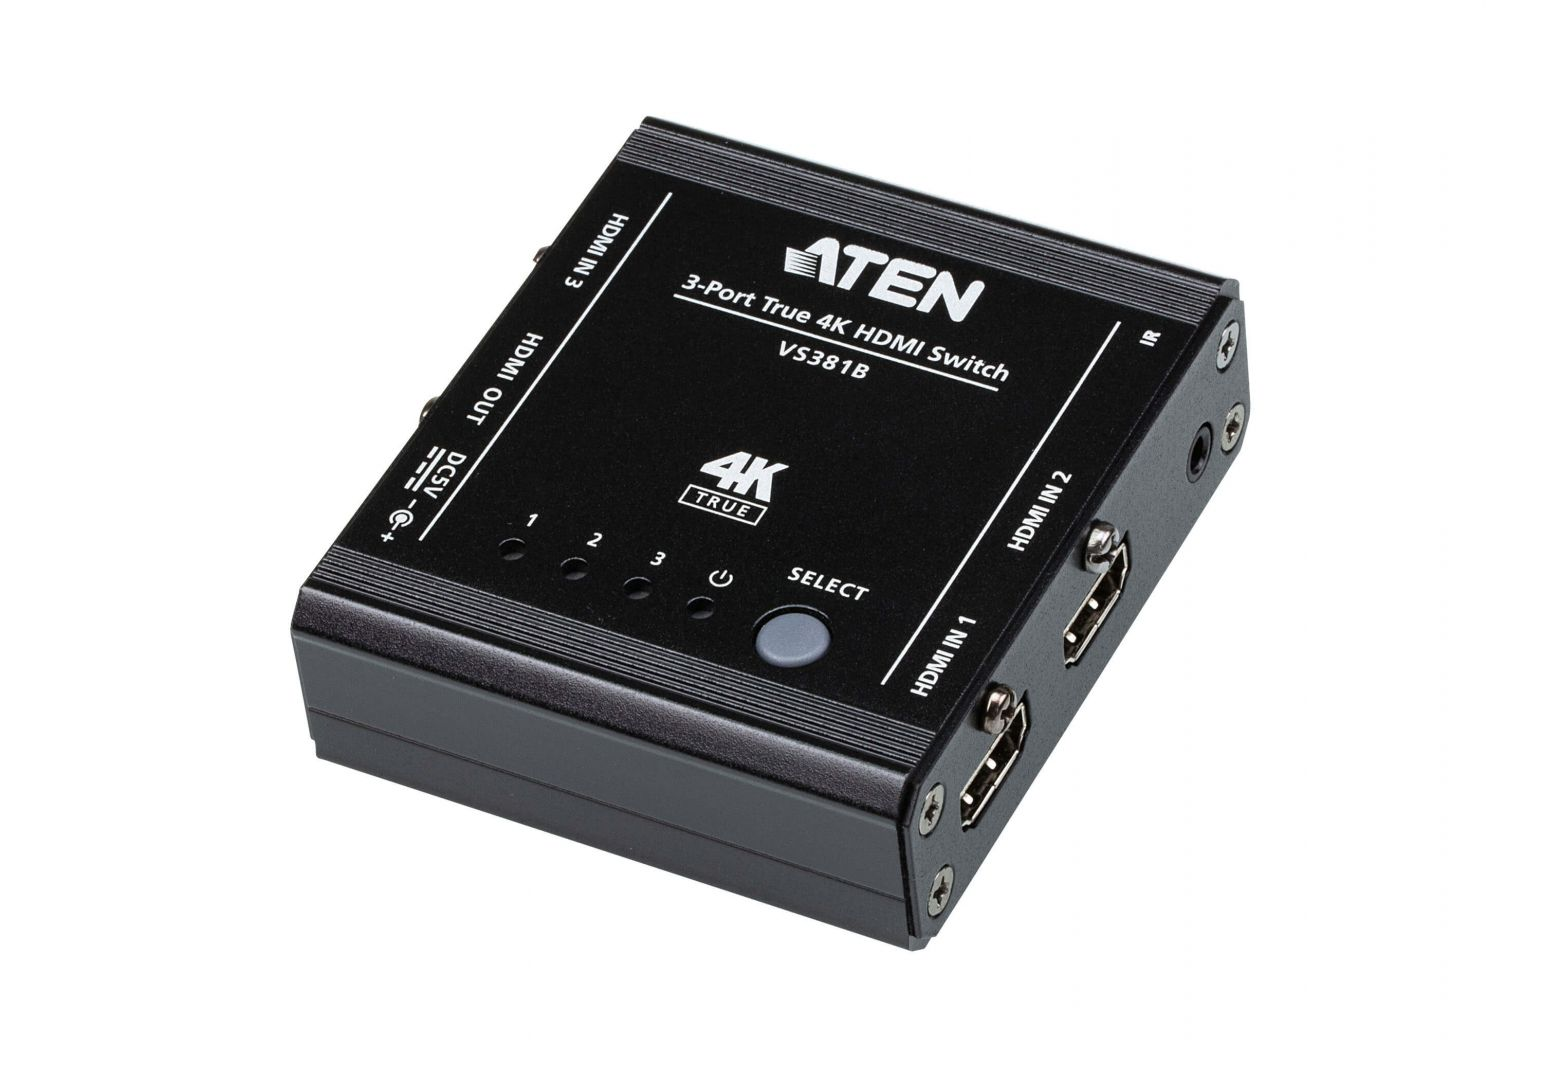 ATEN VS381B 3-Port True 4K HDMI Switch (VS381B)